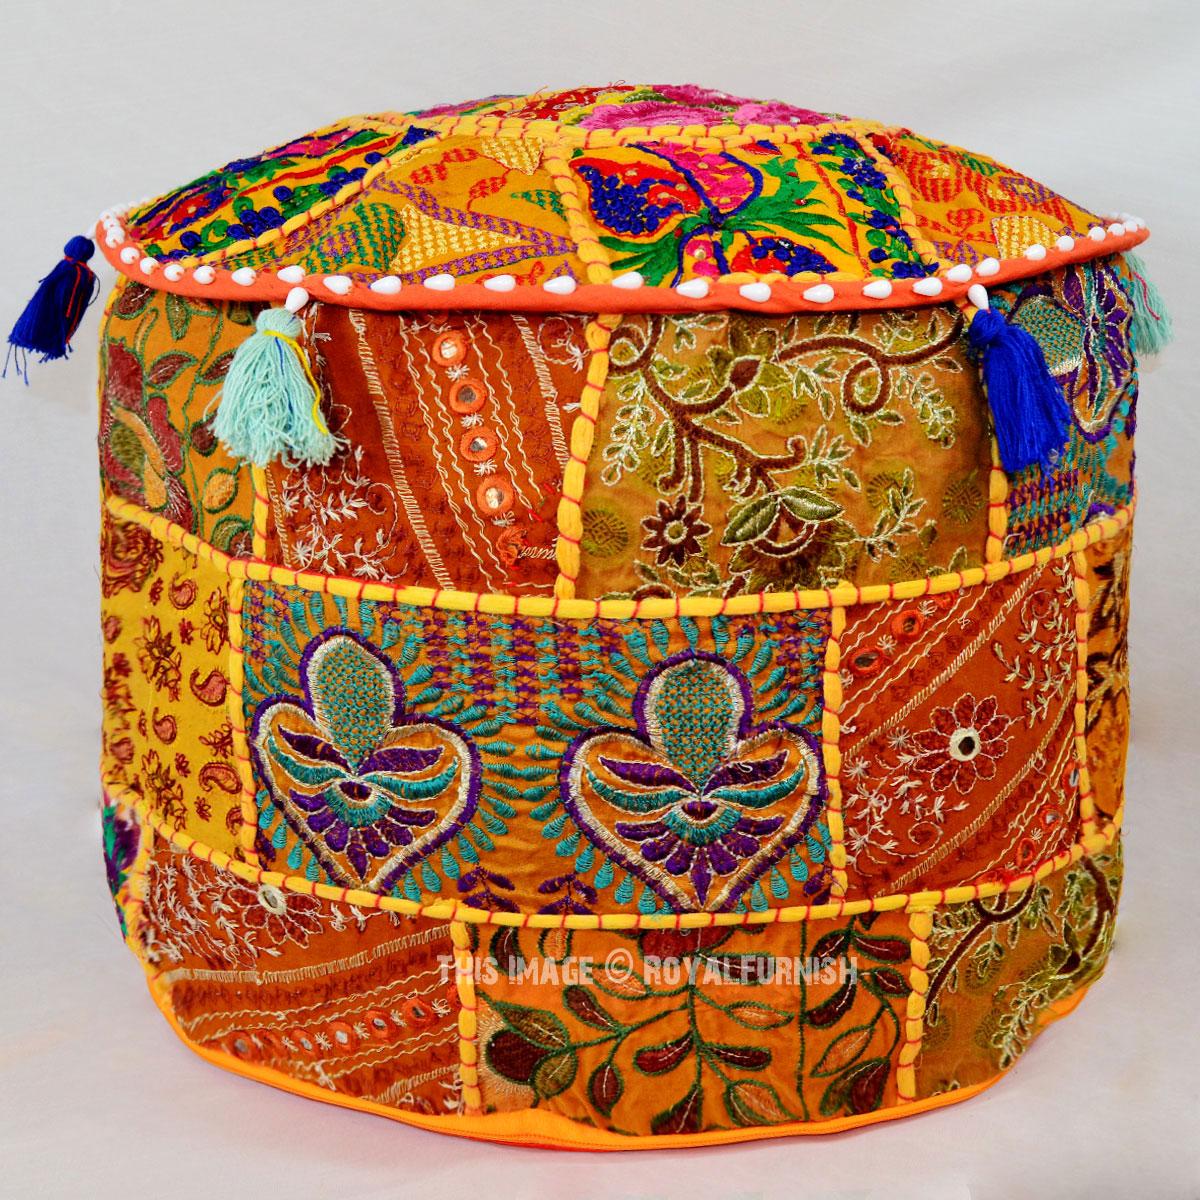 Orange Vintage Handmade Patchwork Round Ottoman Footstool